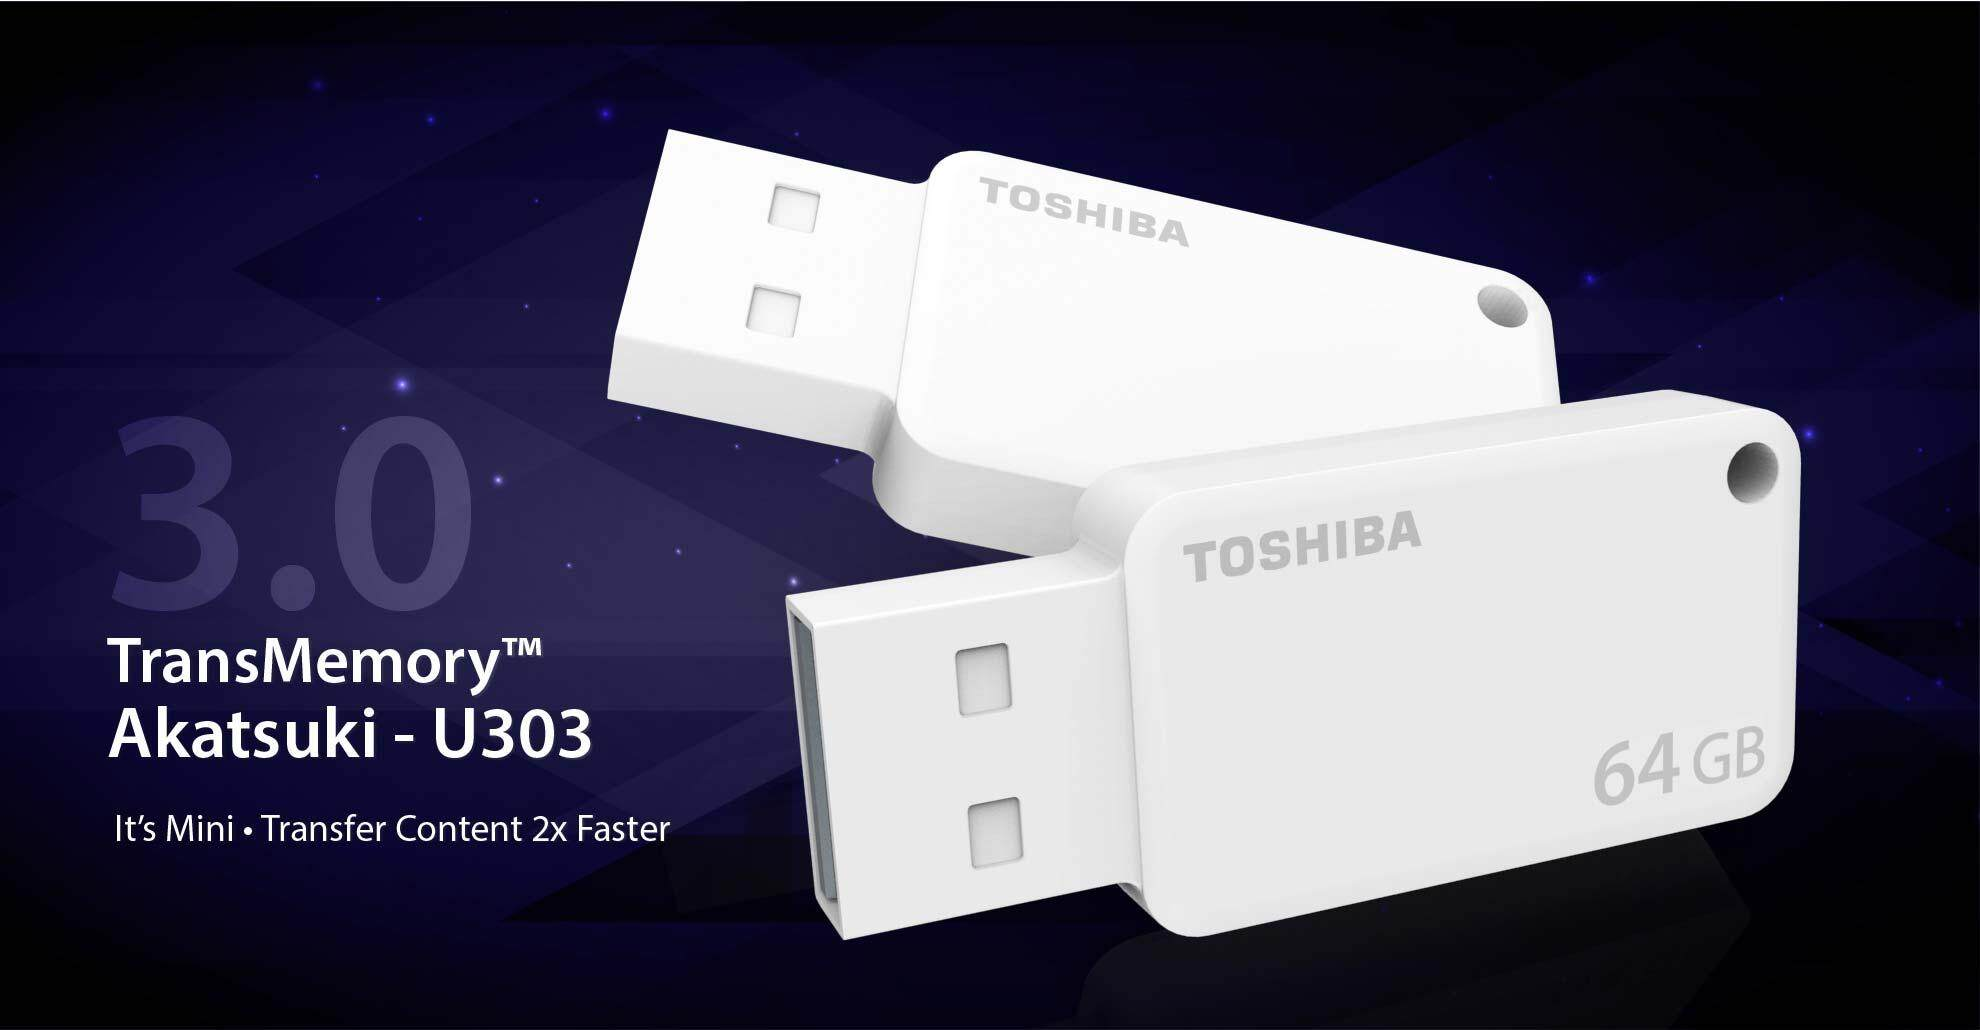 Toshiba Transmemory U303 32gb Super Speed Usb 30 Akatsuki Flash Disk 32 Gb Hayabusa Original Drive White